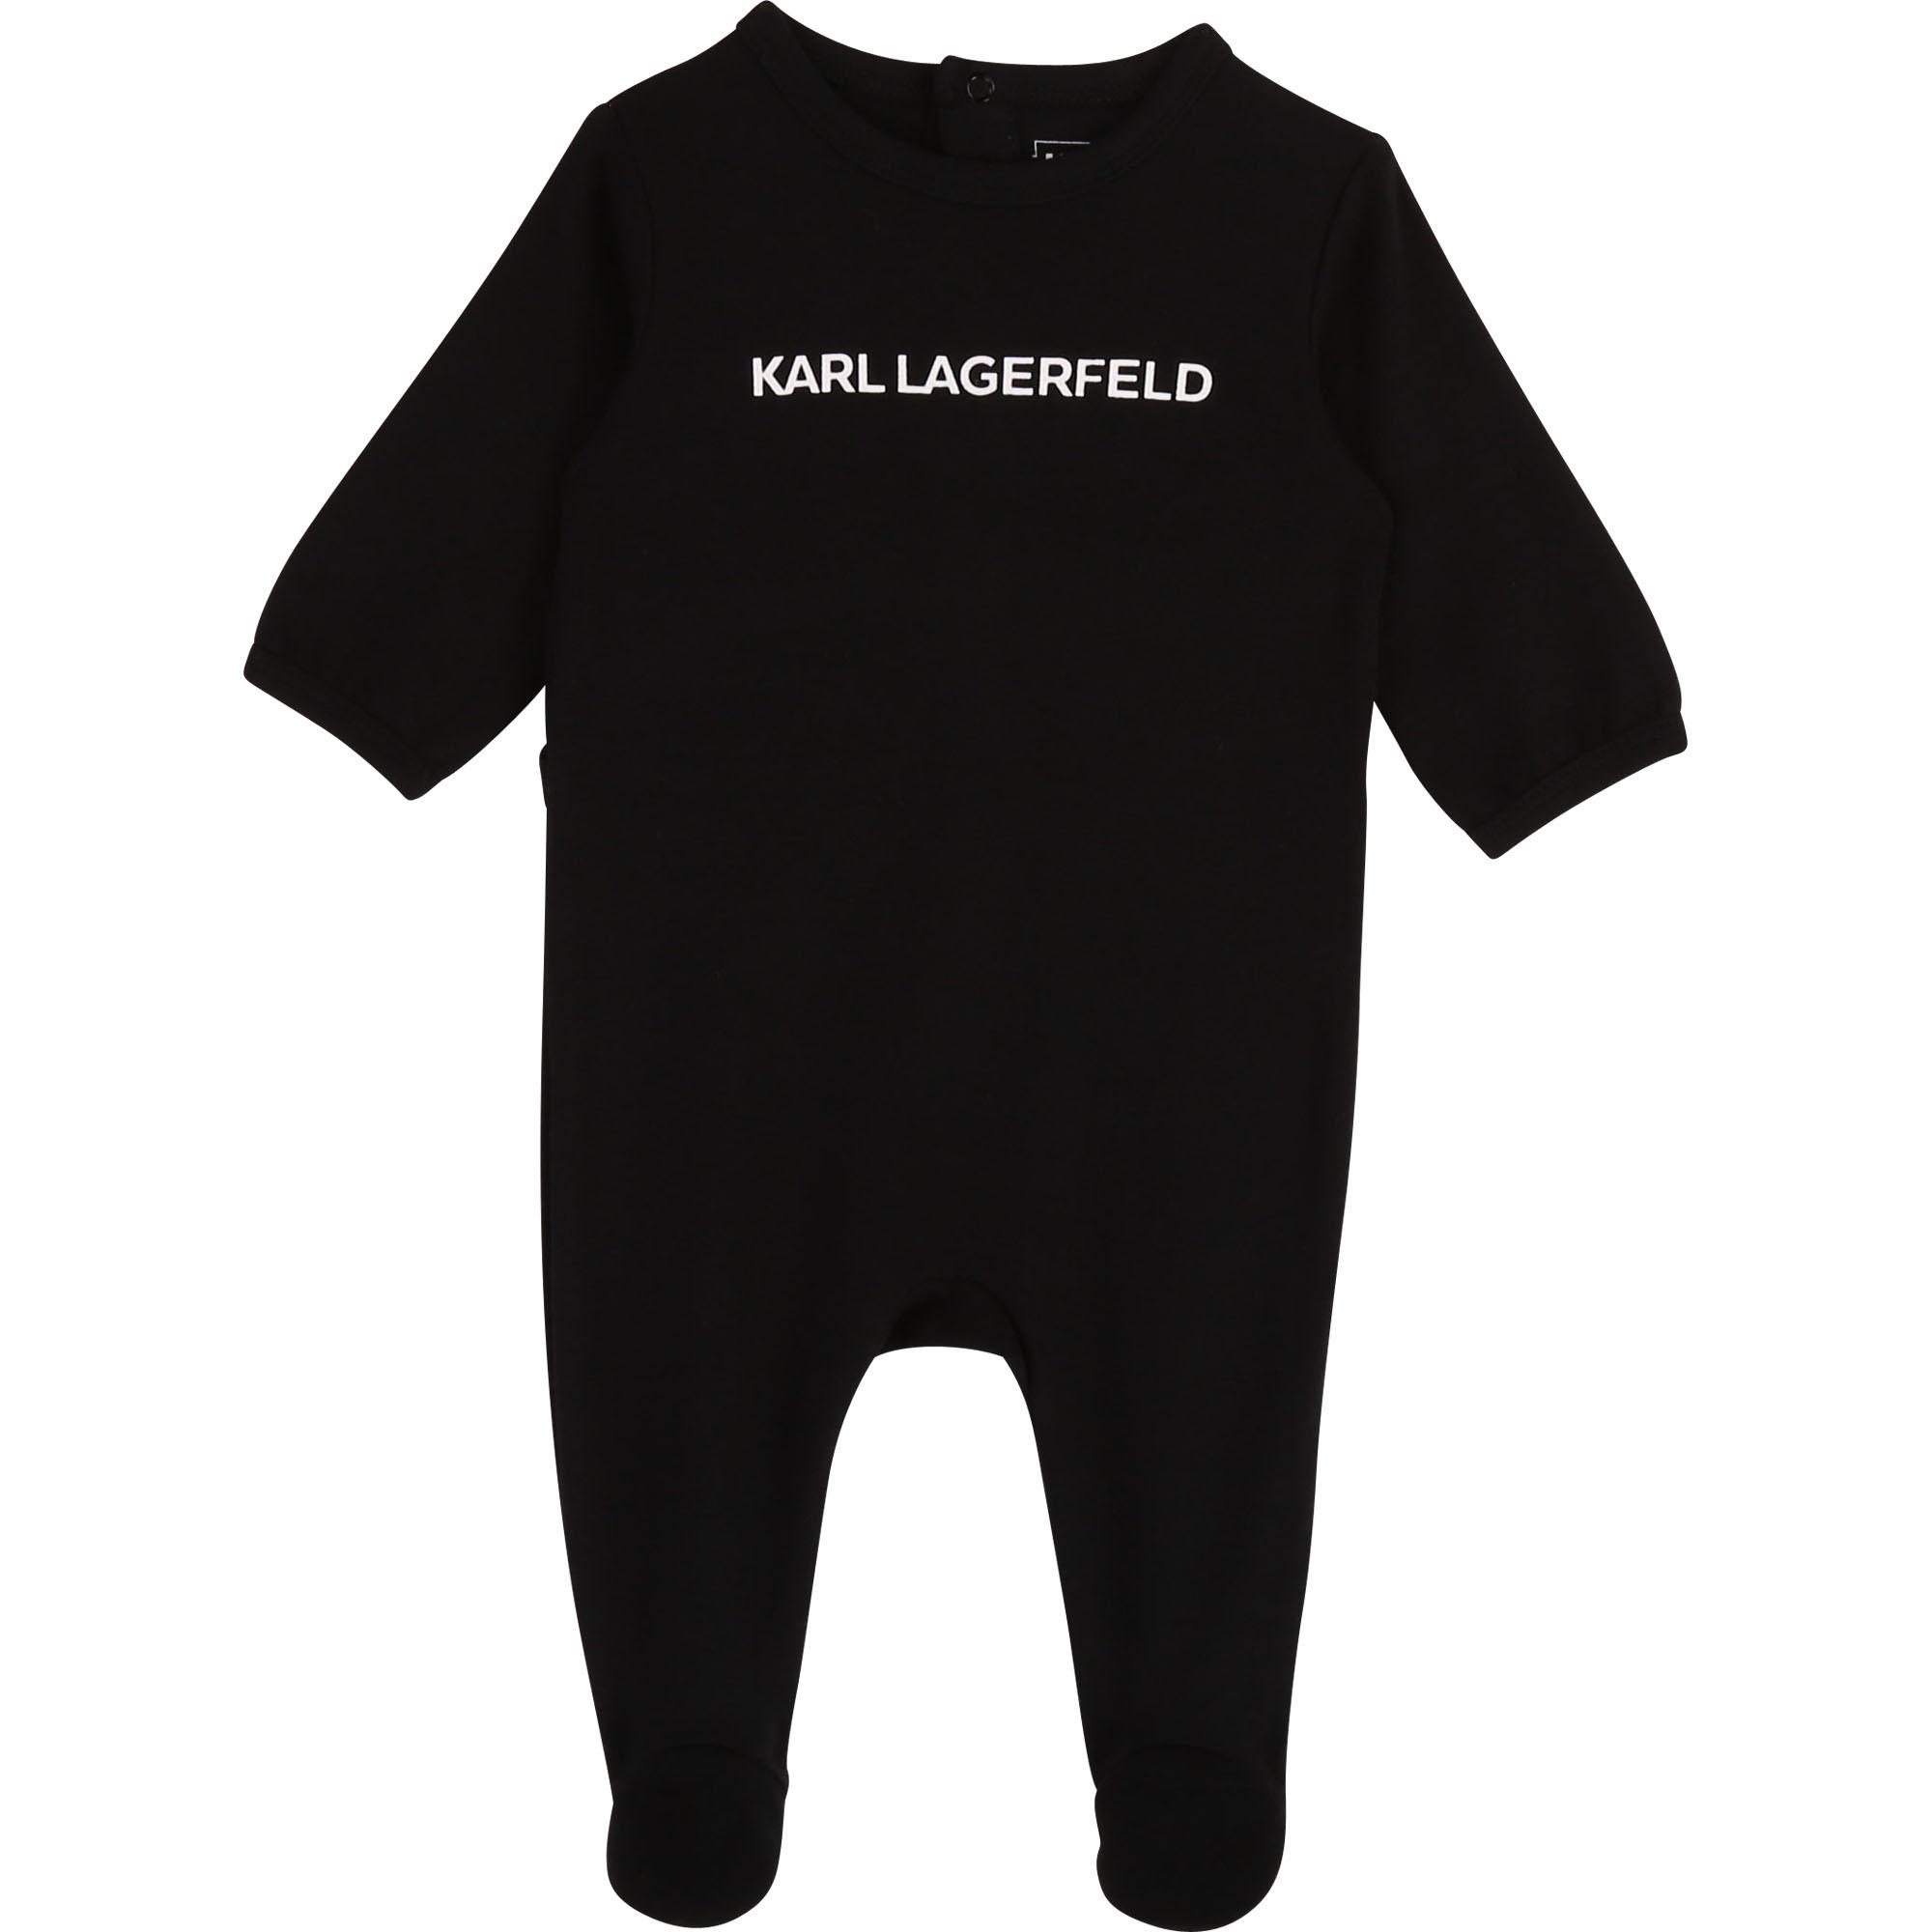 Grenouillère en coton à logo KARL LAGERFELD KIDS BEBE COUCHE UNISEXE Noir